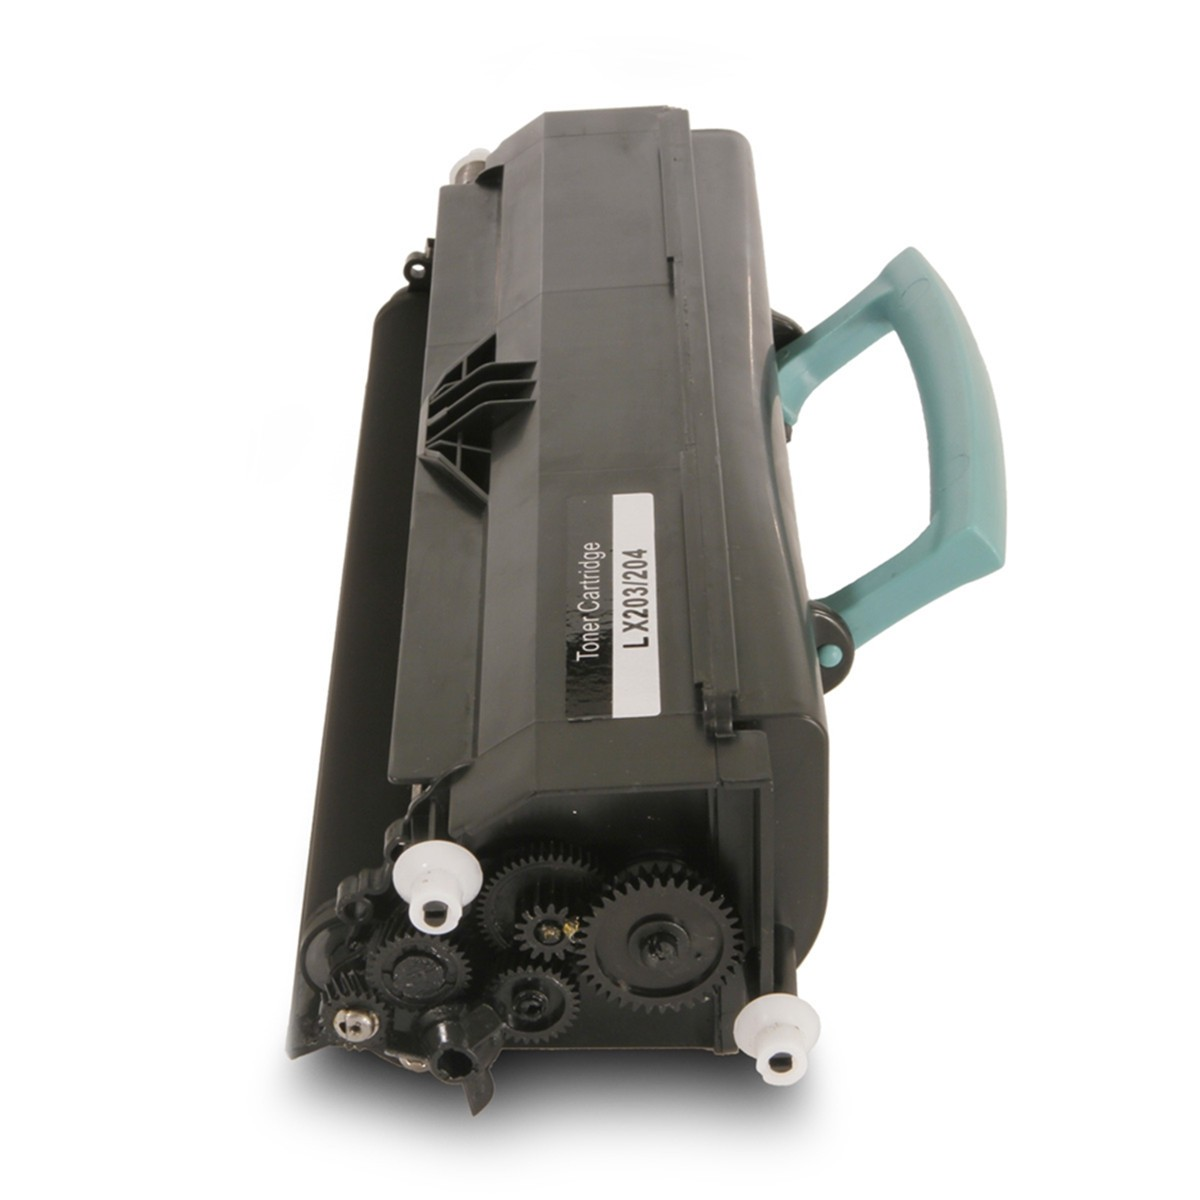 Toner Compatível com Lexmark X203 X204 X204N X203N X203A11G